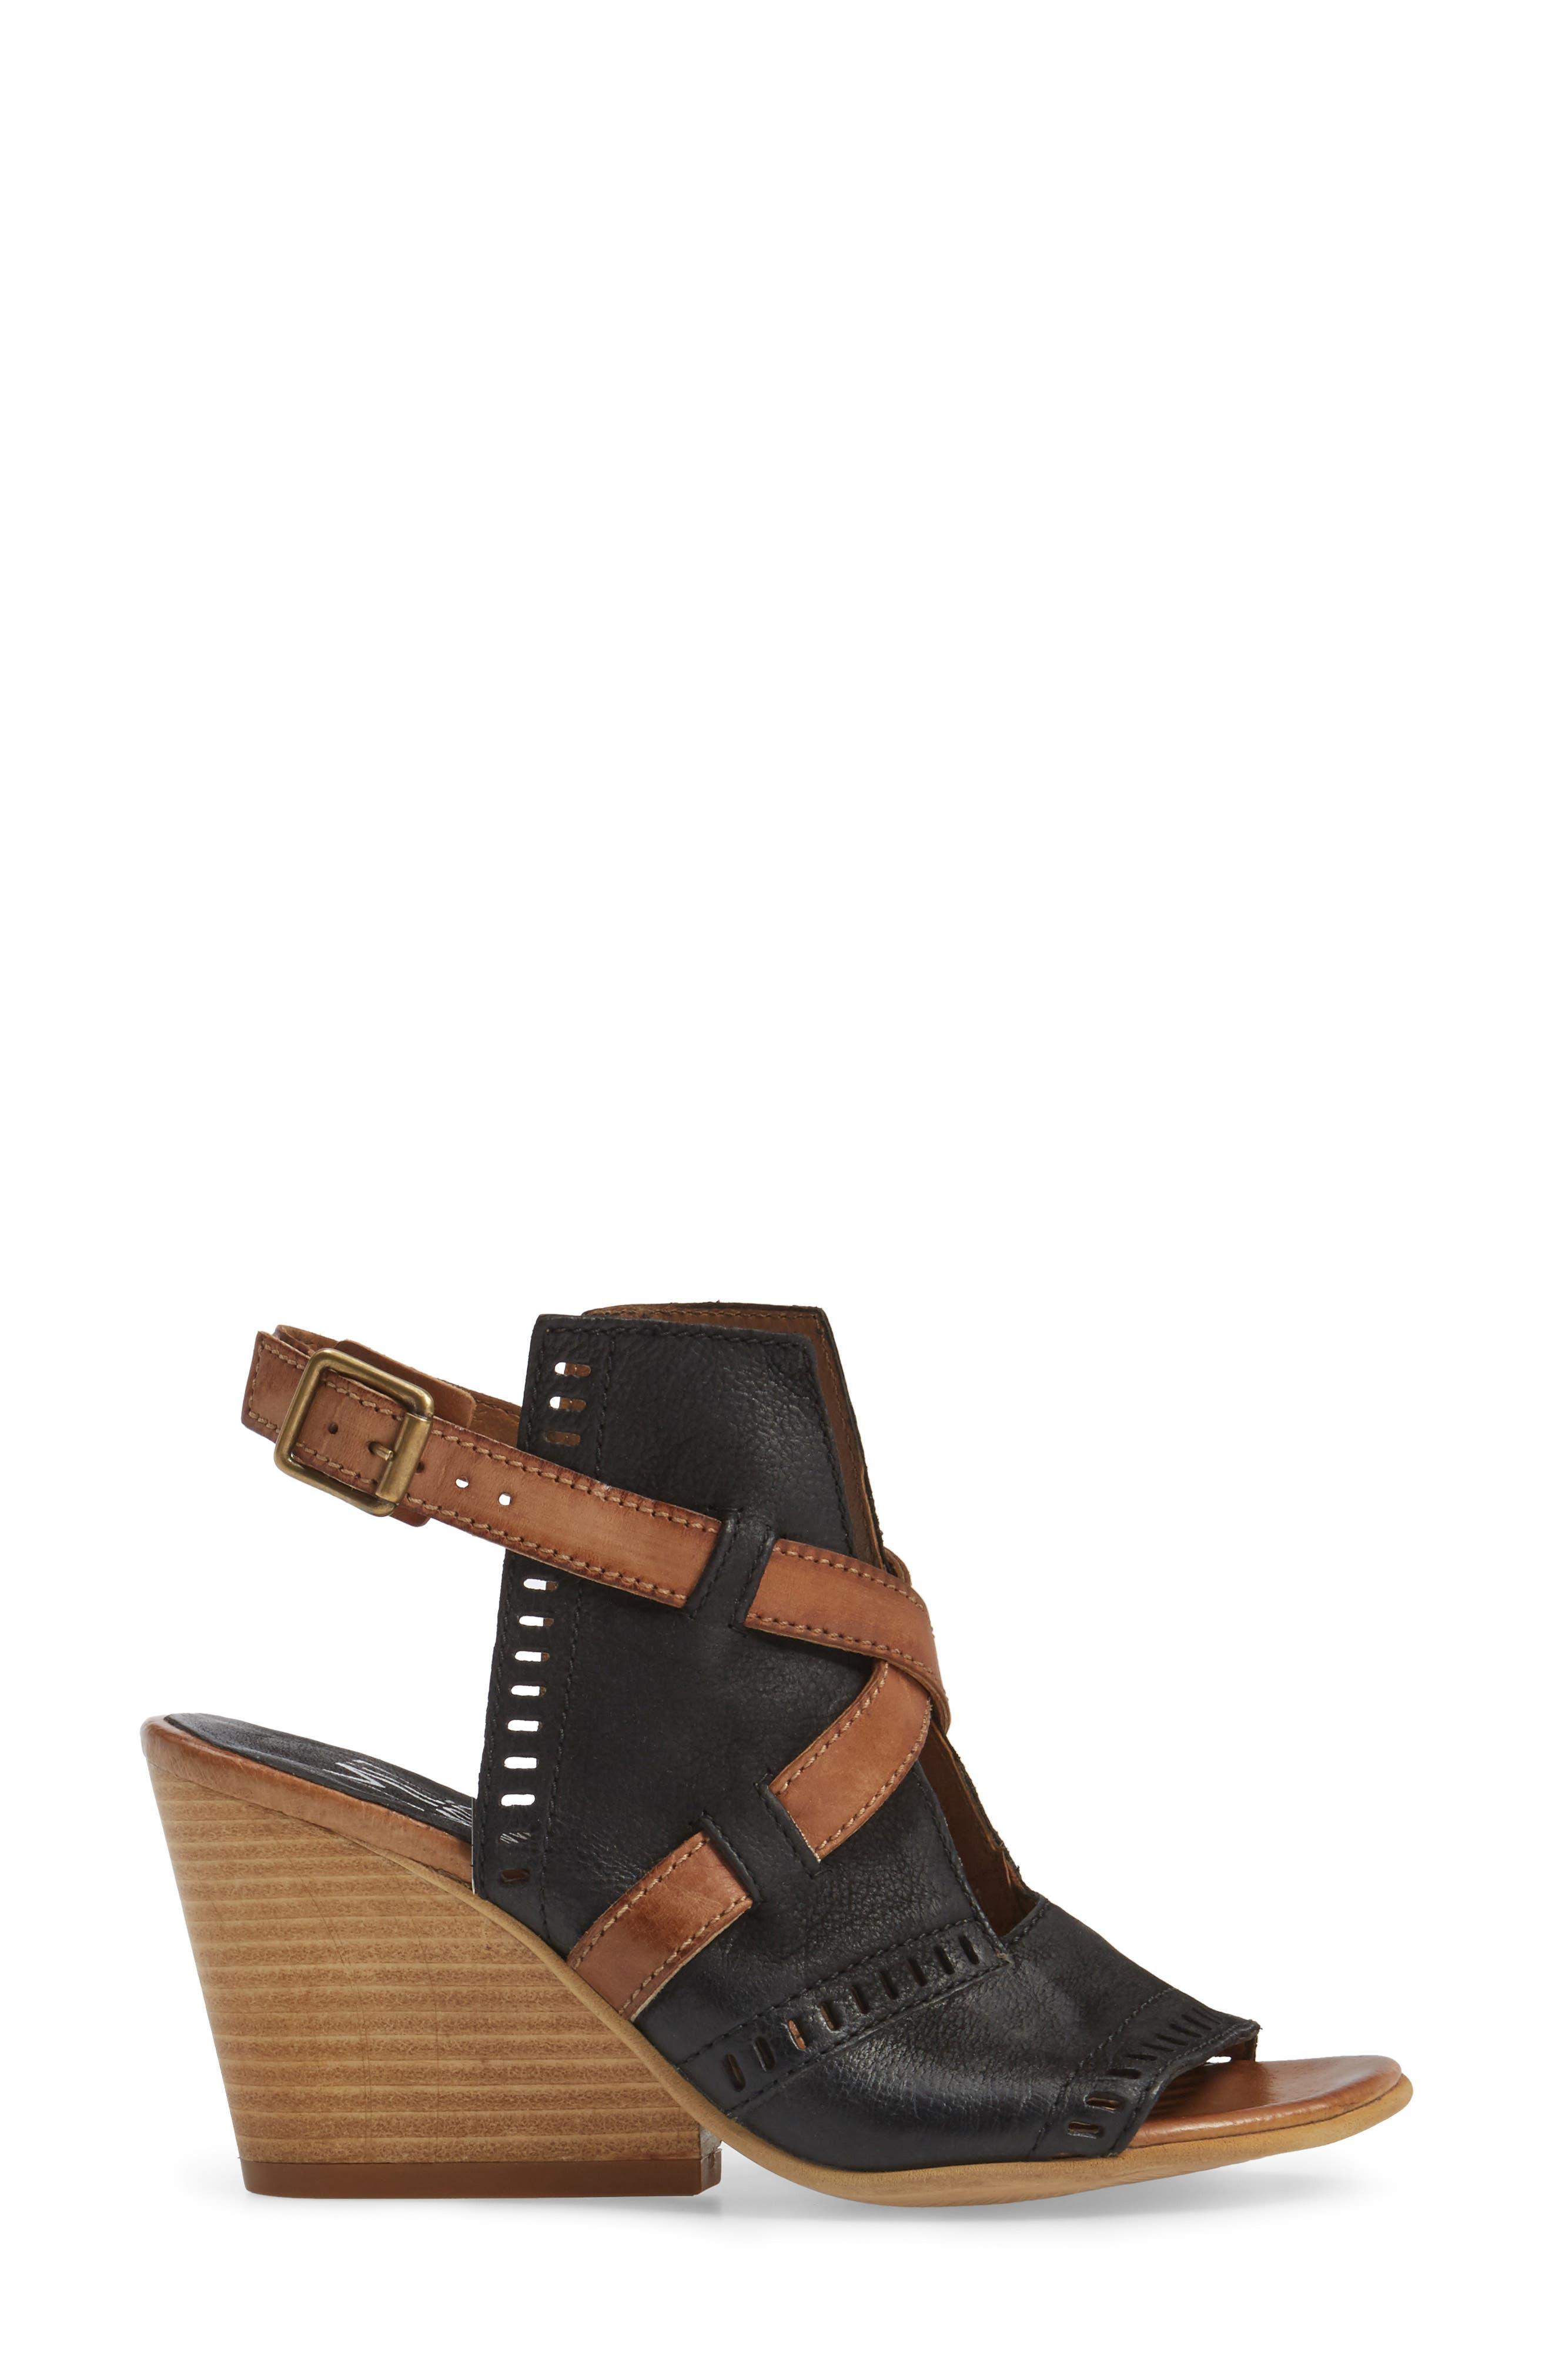 Kipling Perforated Sandal,                             Alternate thumbnail 9, color,